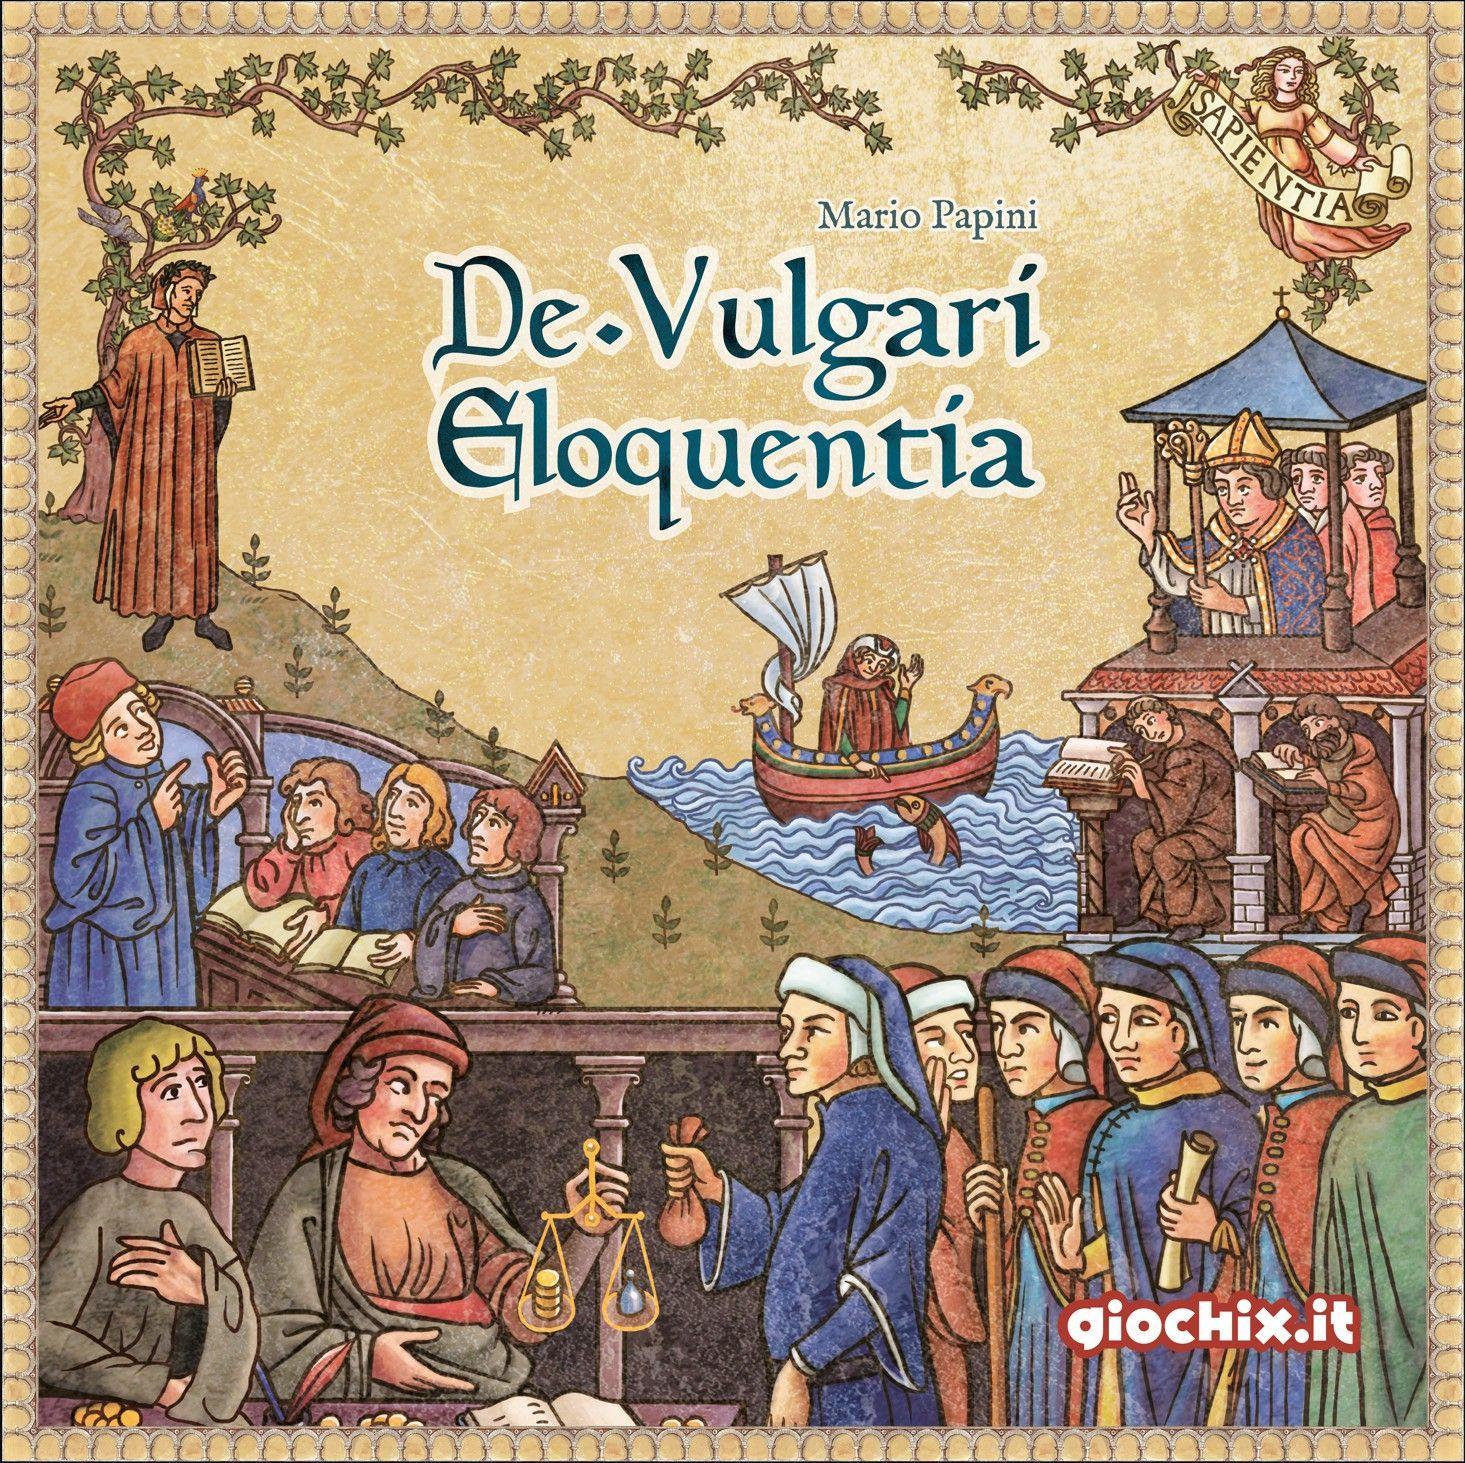 De Vulgari Eloquentia: Deluxe Edition